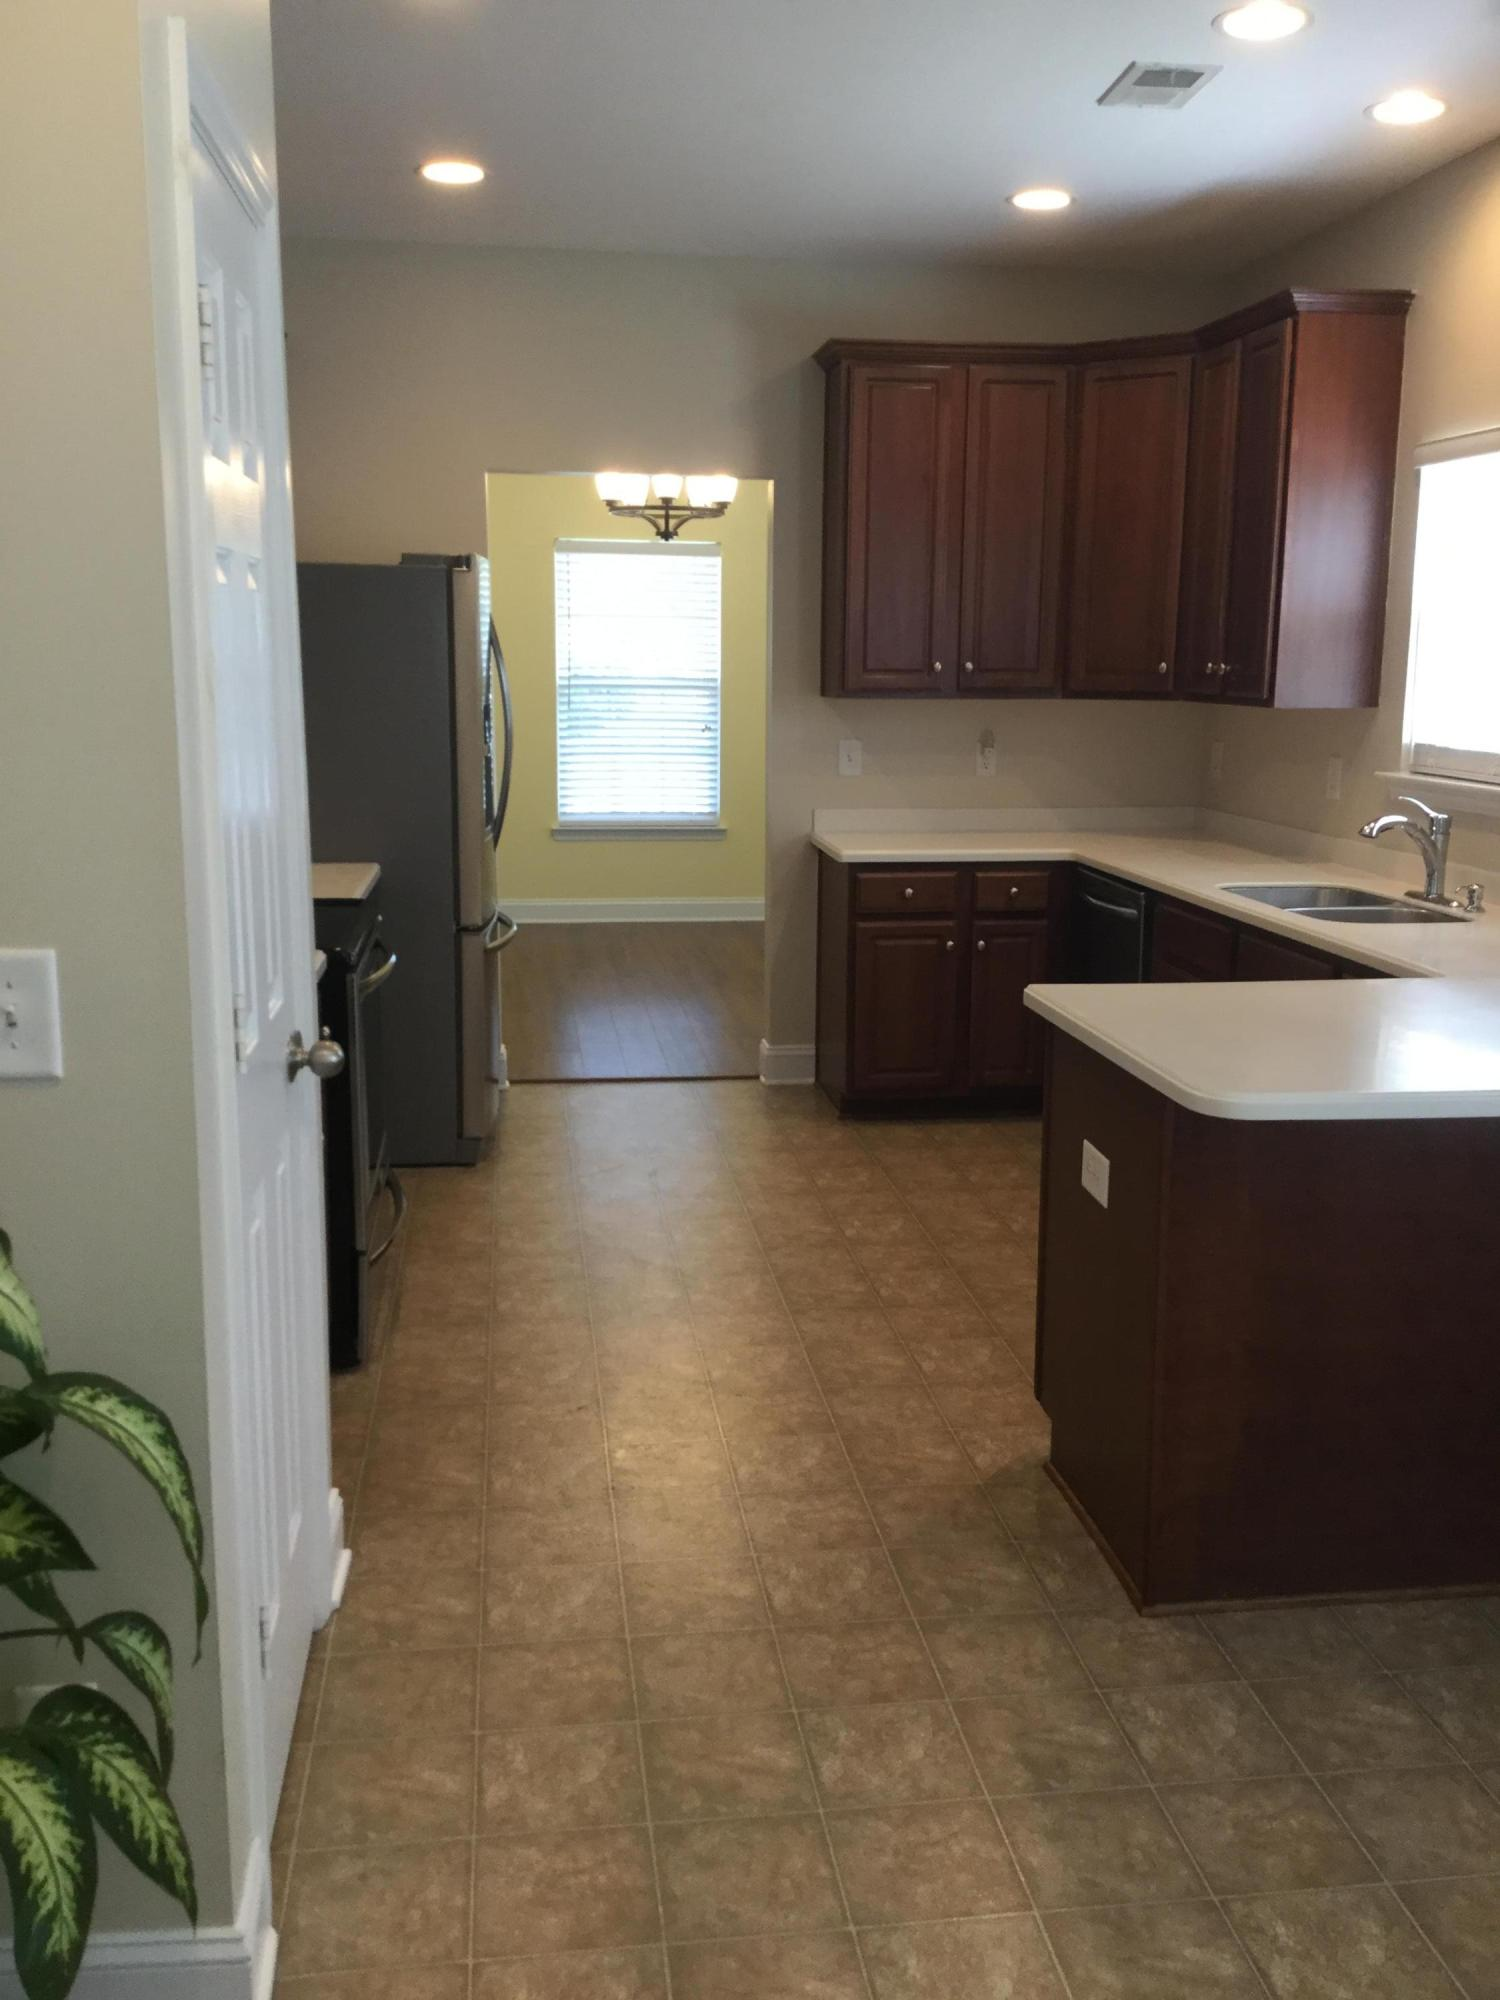 Kennsington Homes For Sale - 122 Heatherlock, Hanahan, SC - 14